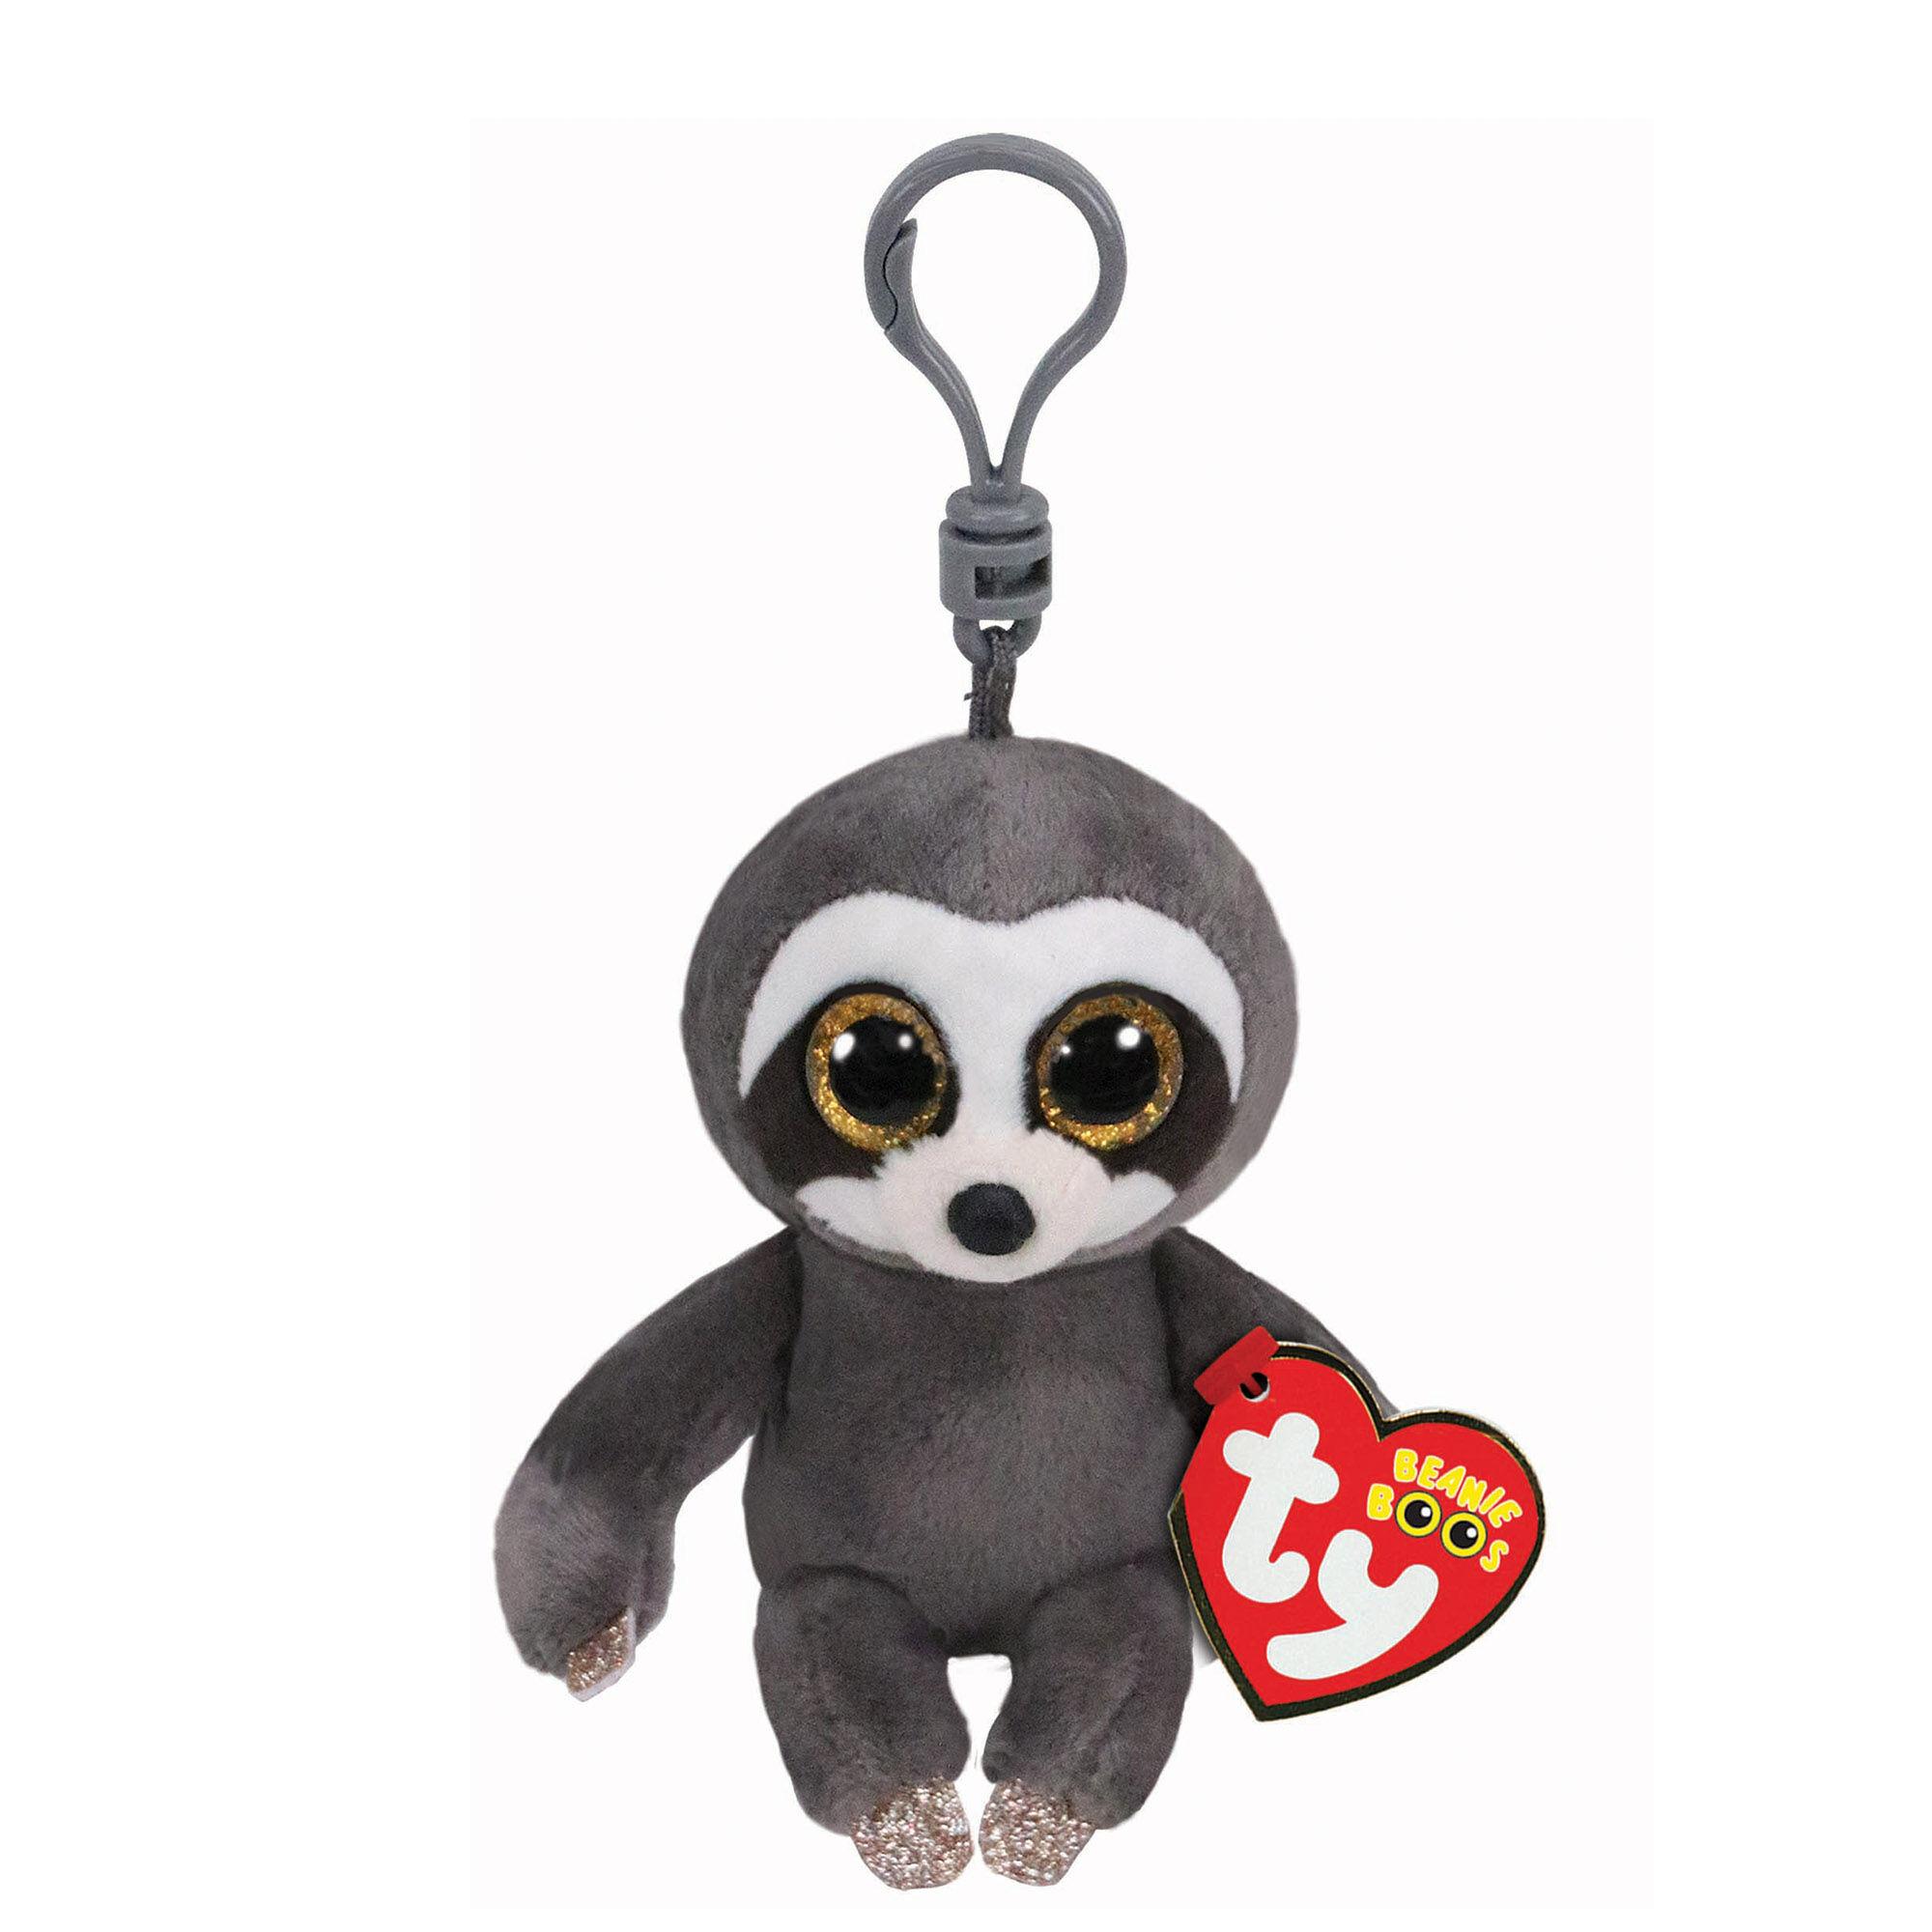 Rare Ty Beanie Boos Muffin Key Clip W/ Tags ~ Htf Plush Stuffed Animal Key Chain Retired